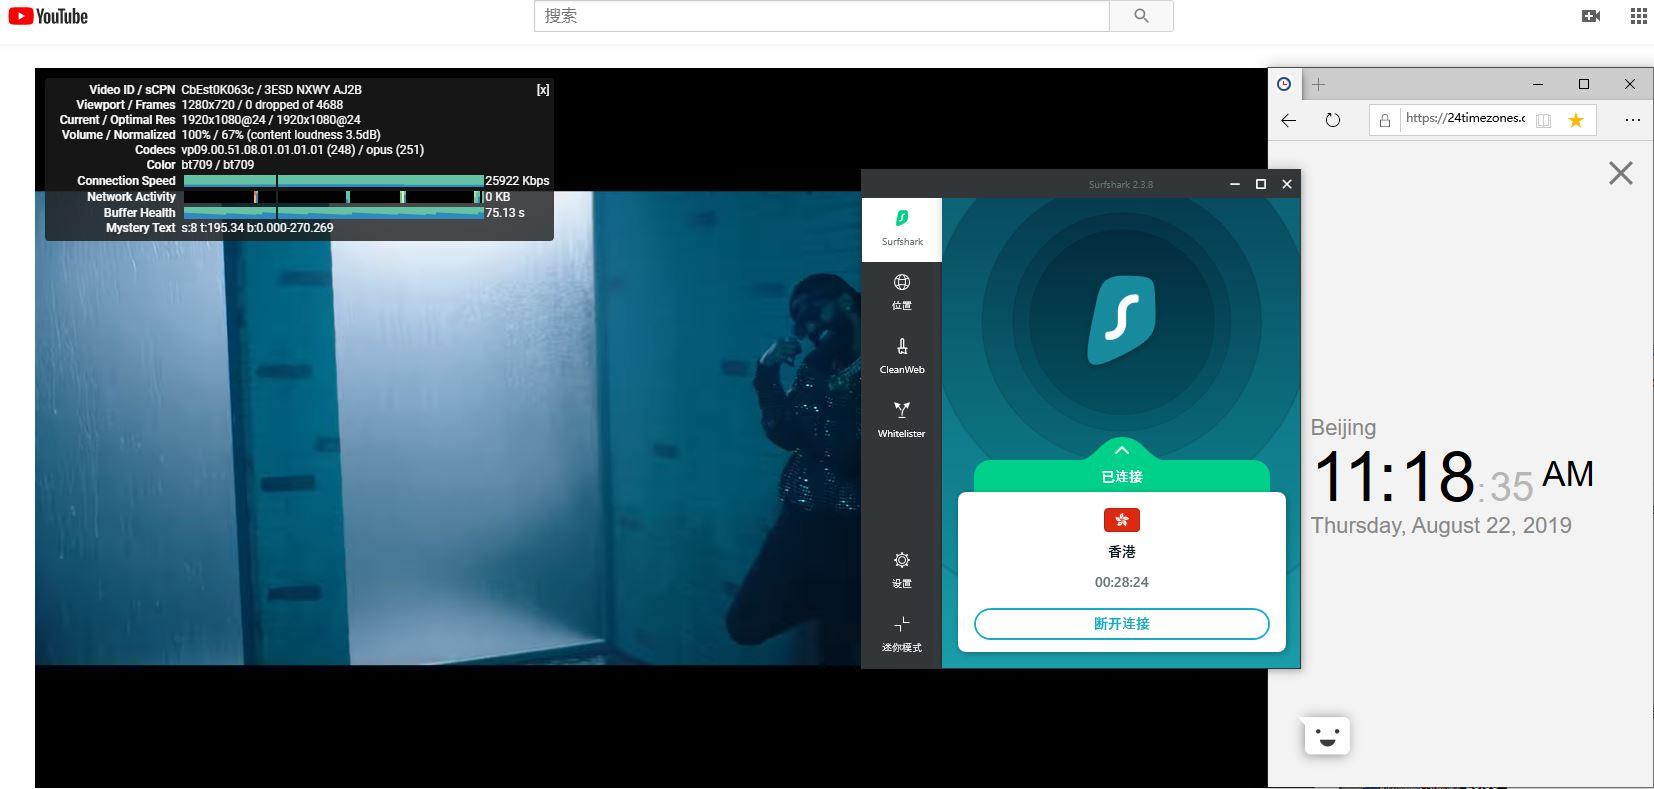 windows SurfsharkVPN 香港服务器 中国翻墙 科学上网 YouTube测试-20190822